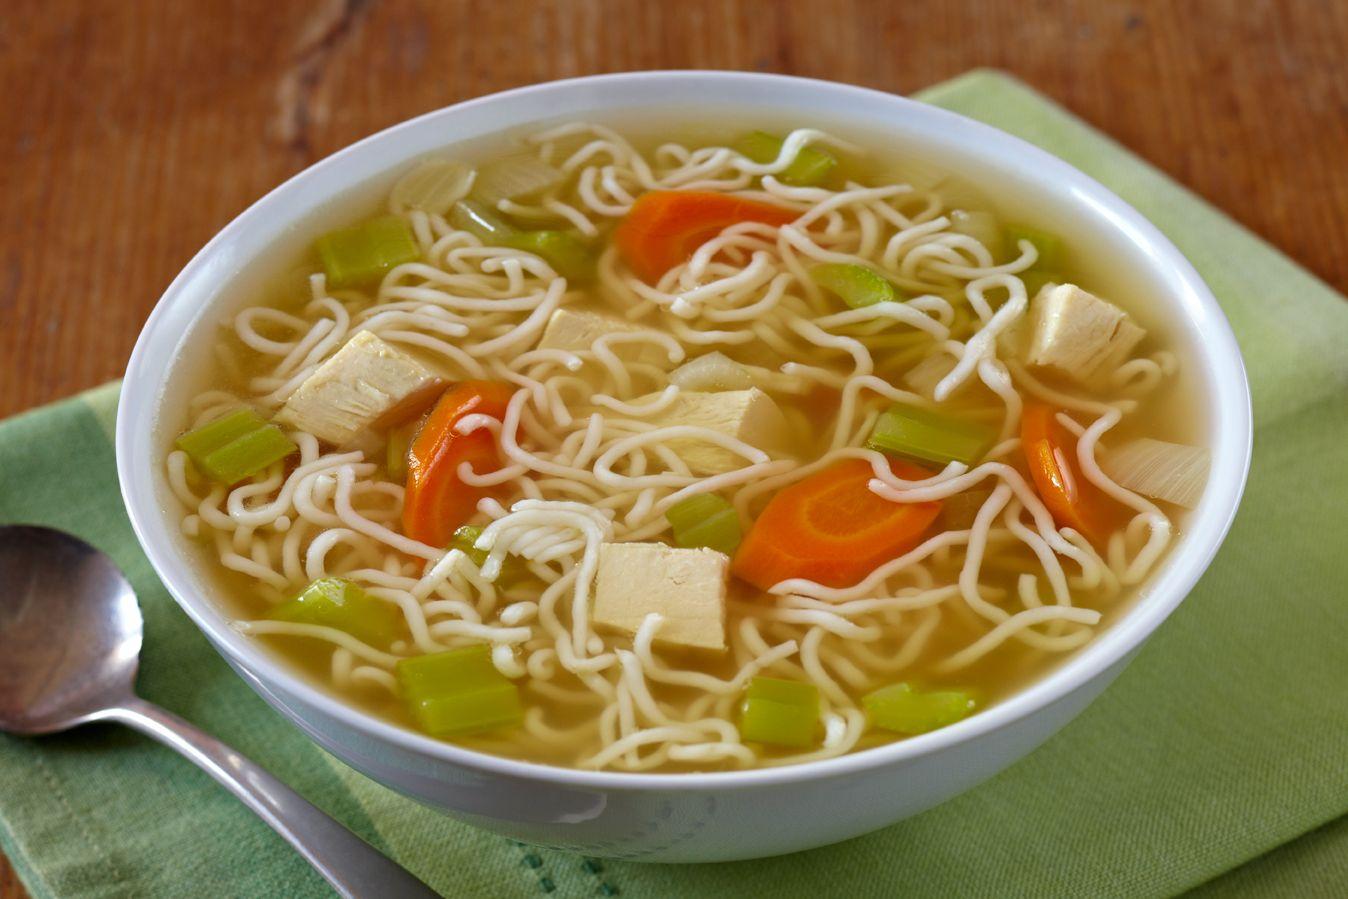 Chicken noodle soup with tofu shirataki yummies yaya pinterest food chicken noodle soup forumfinder Choice Image